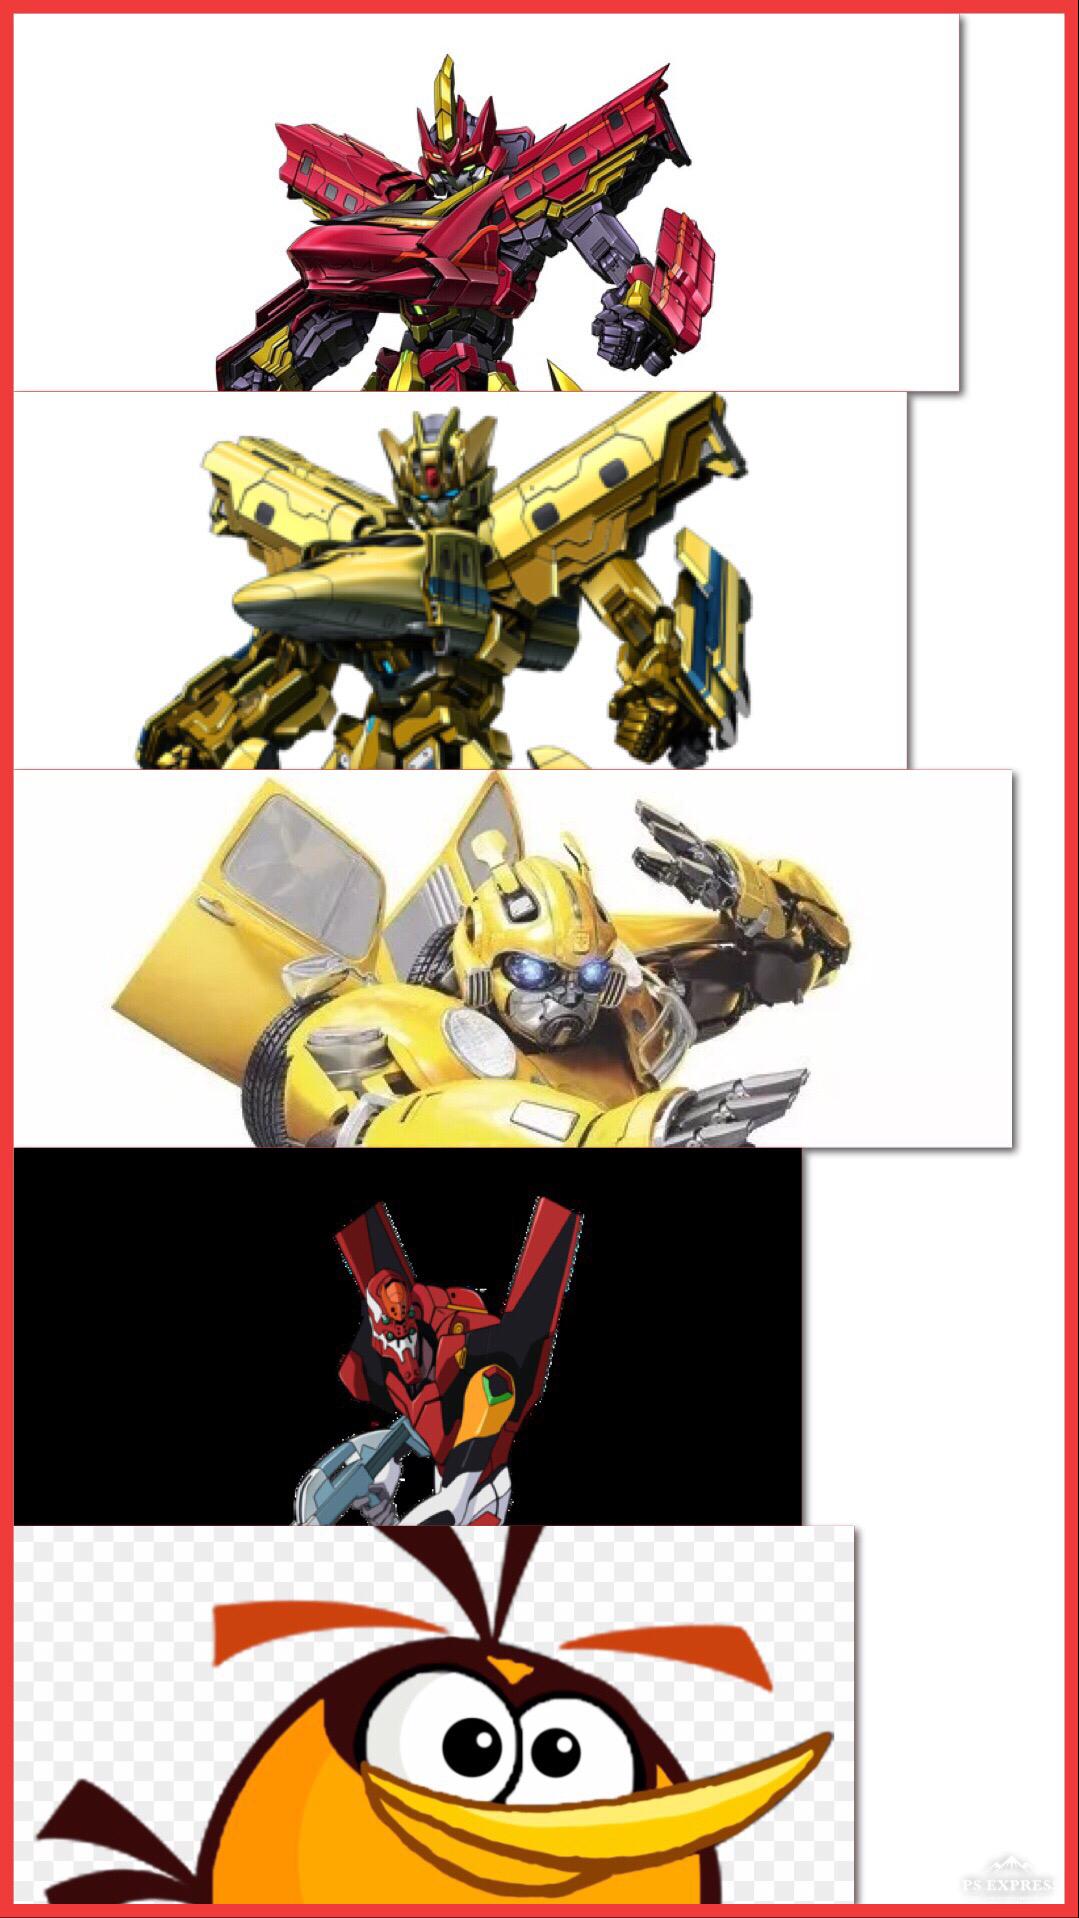 Transformers & shinkalion